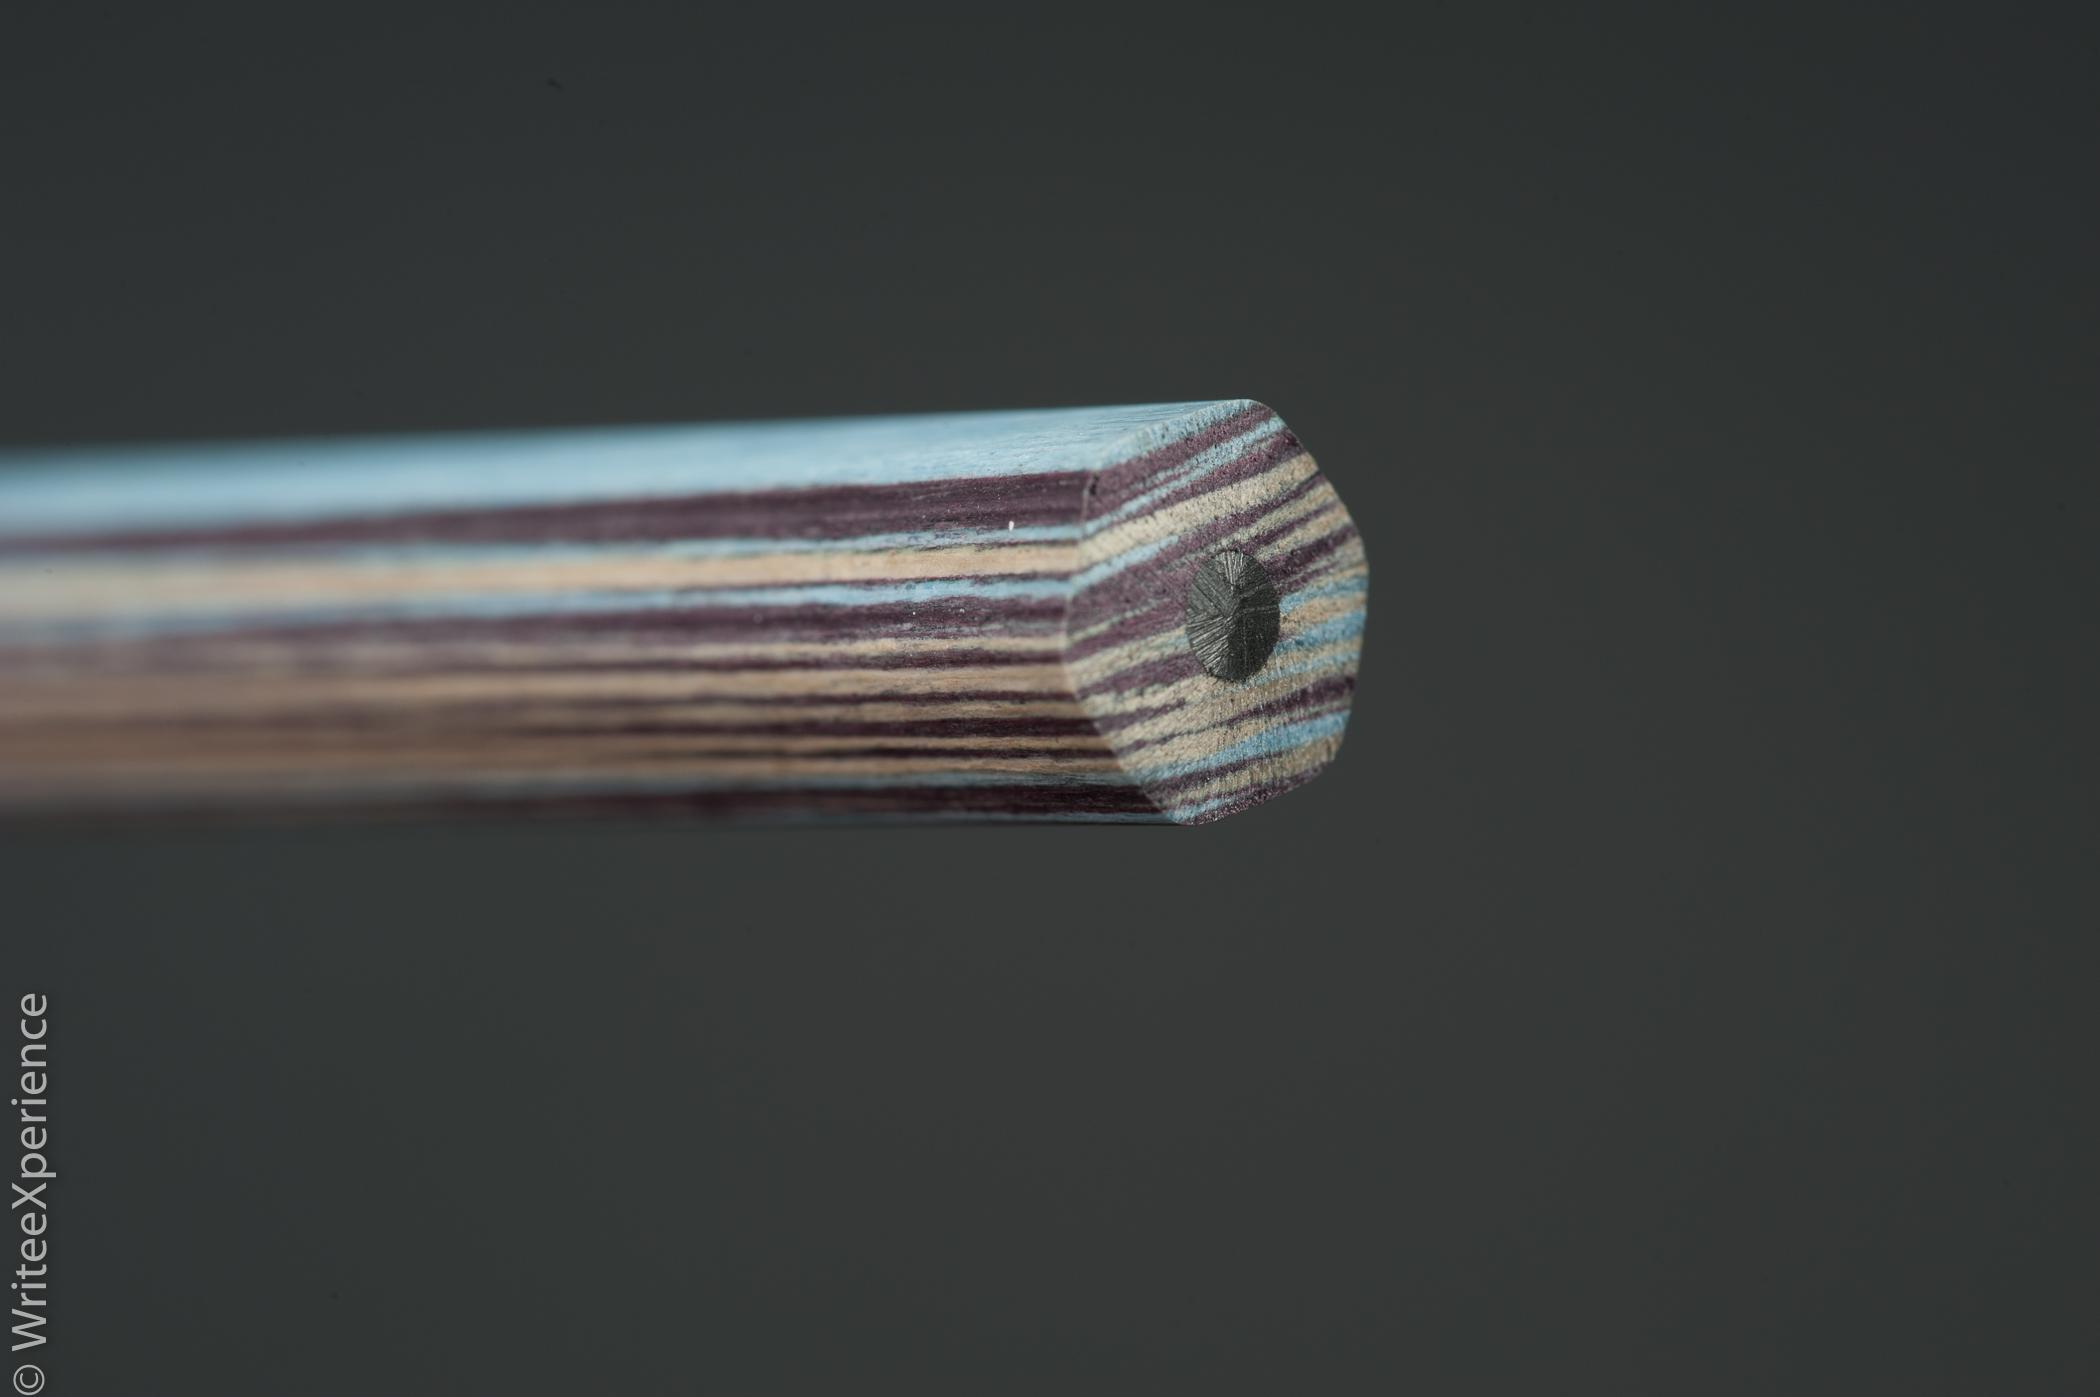 WriteeXperience-Caran-dache-noblewood-pencils-5th-14.jpg